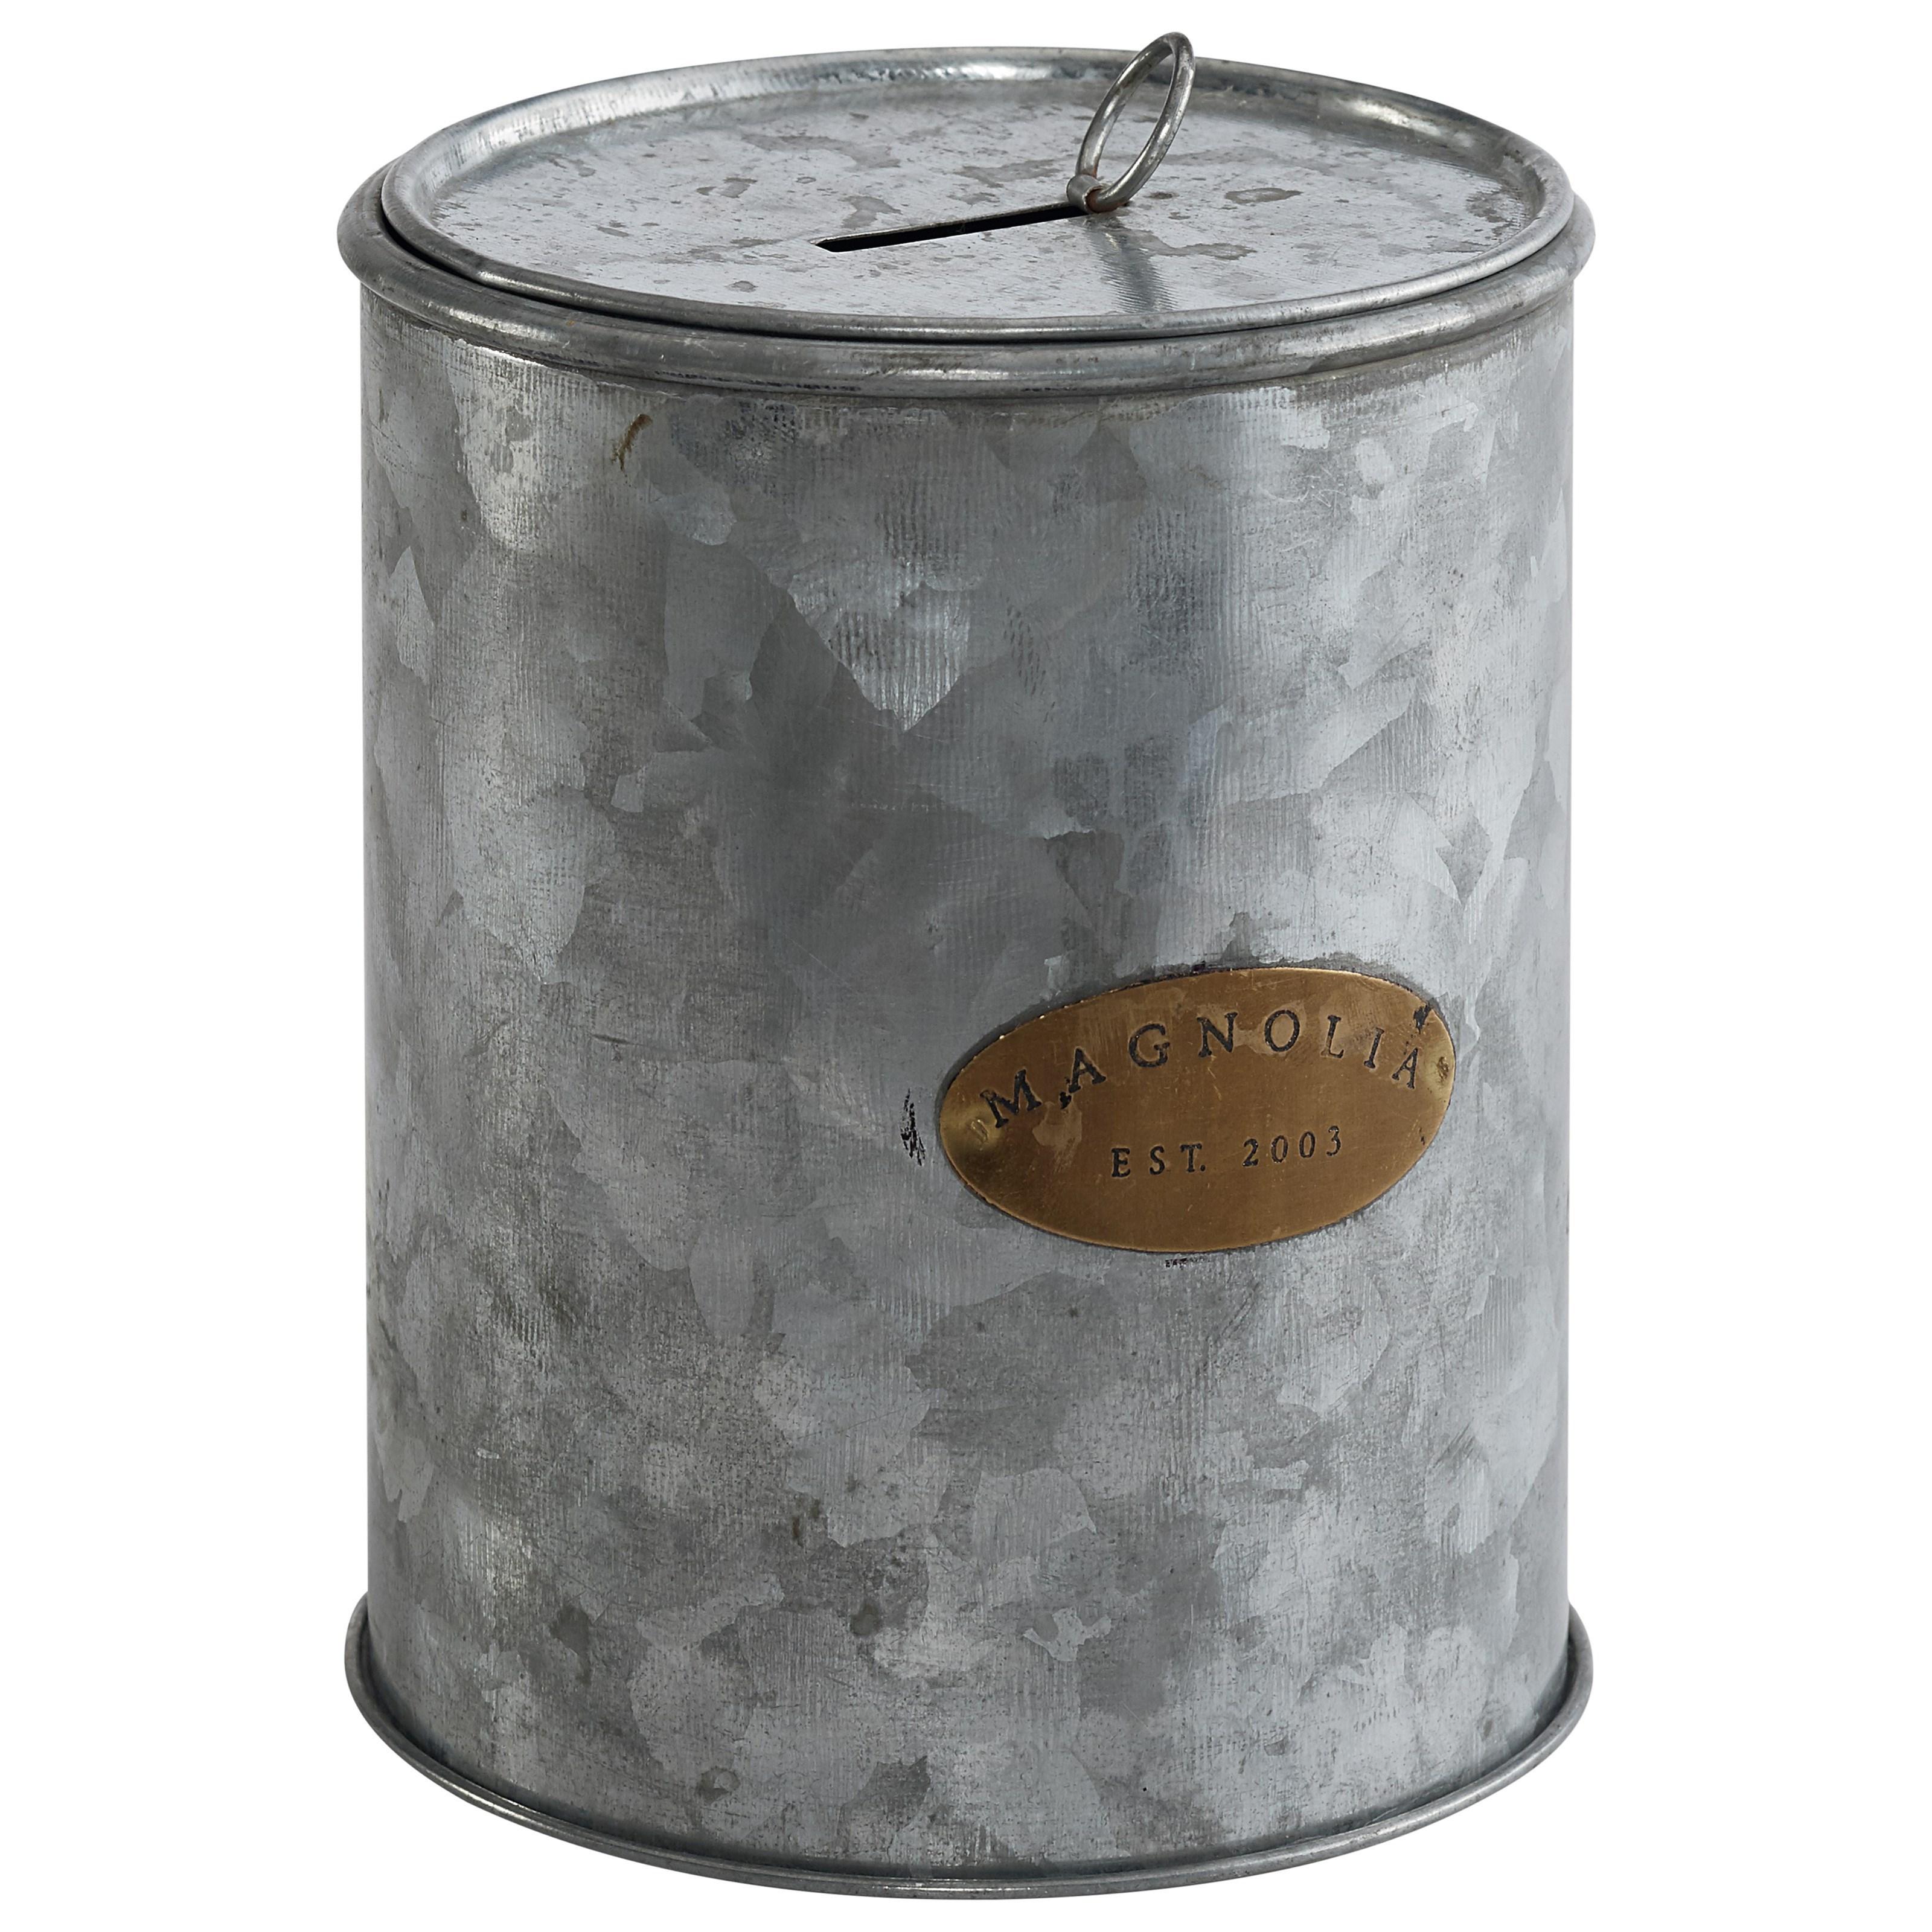 Zinc Finish Furniture Tin Magnolia Petite Coin Canwith Aged Zinc Finish By Magnolia Home